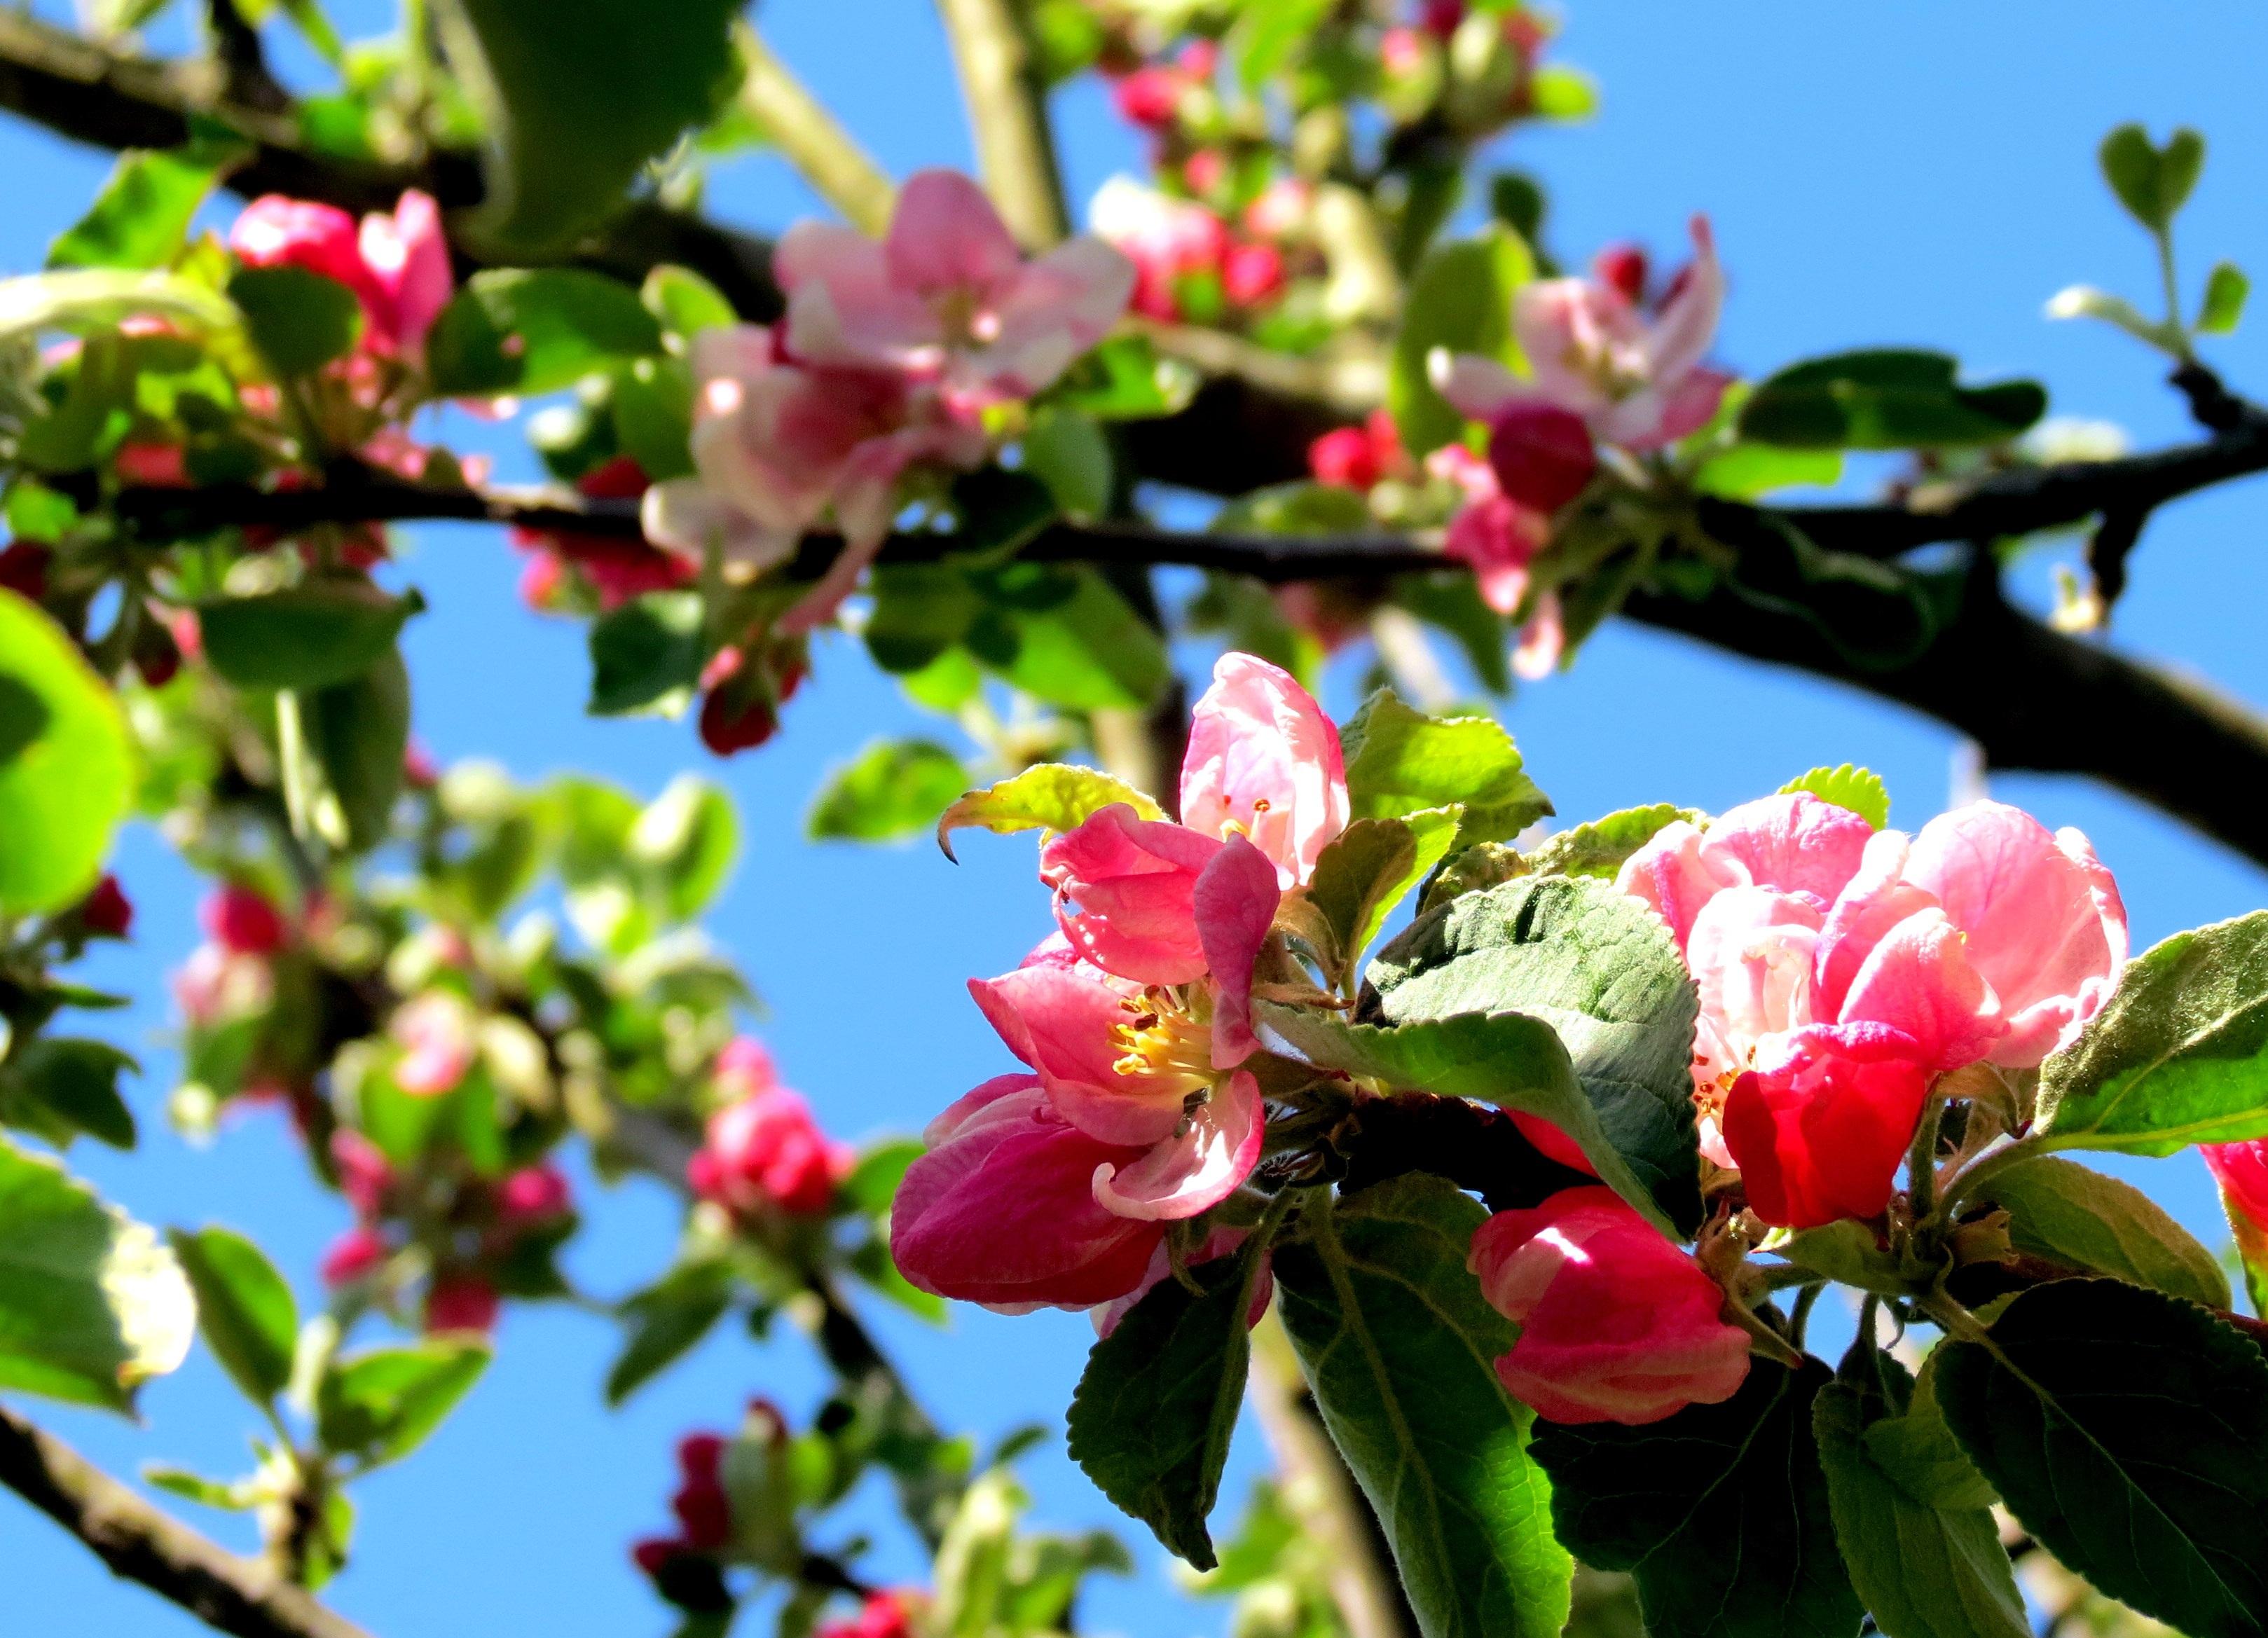 Free Images Apple Tree Nature Branch Blossom Leaf Flower